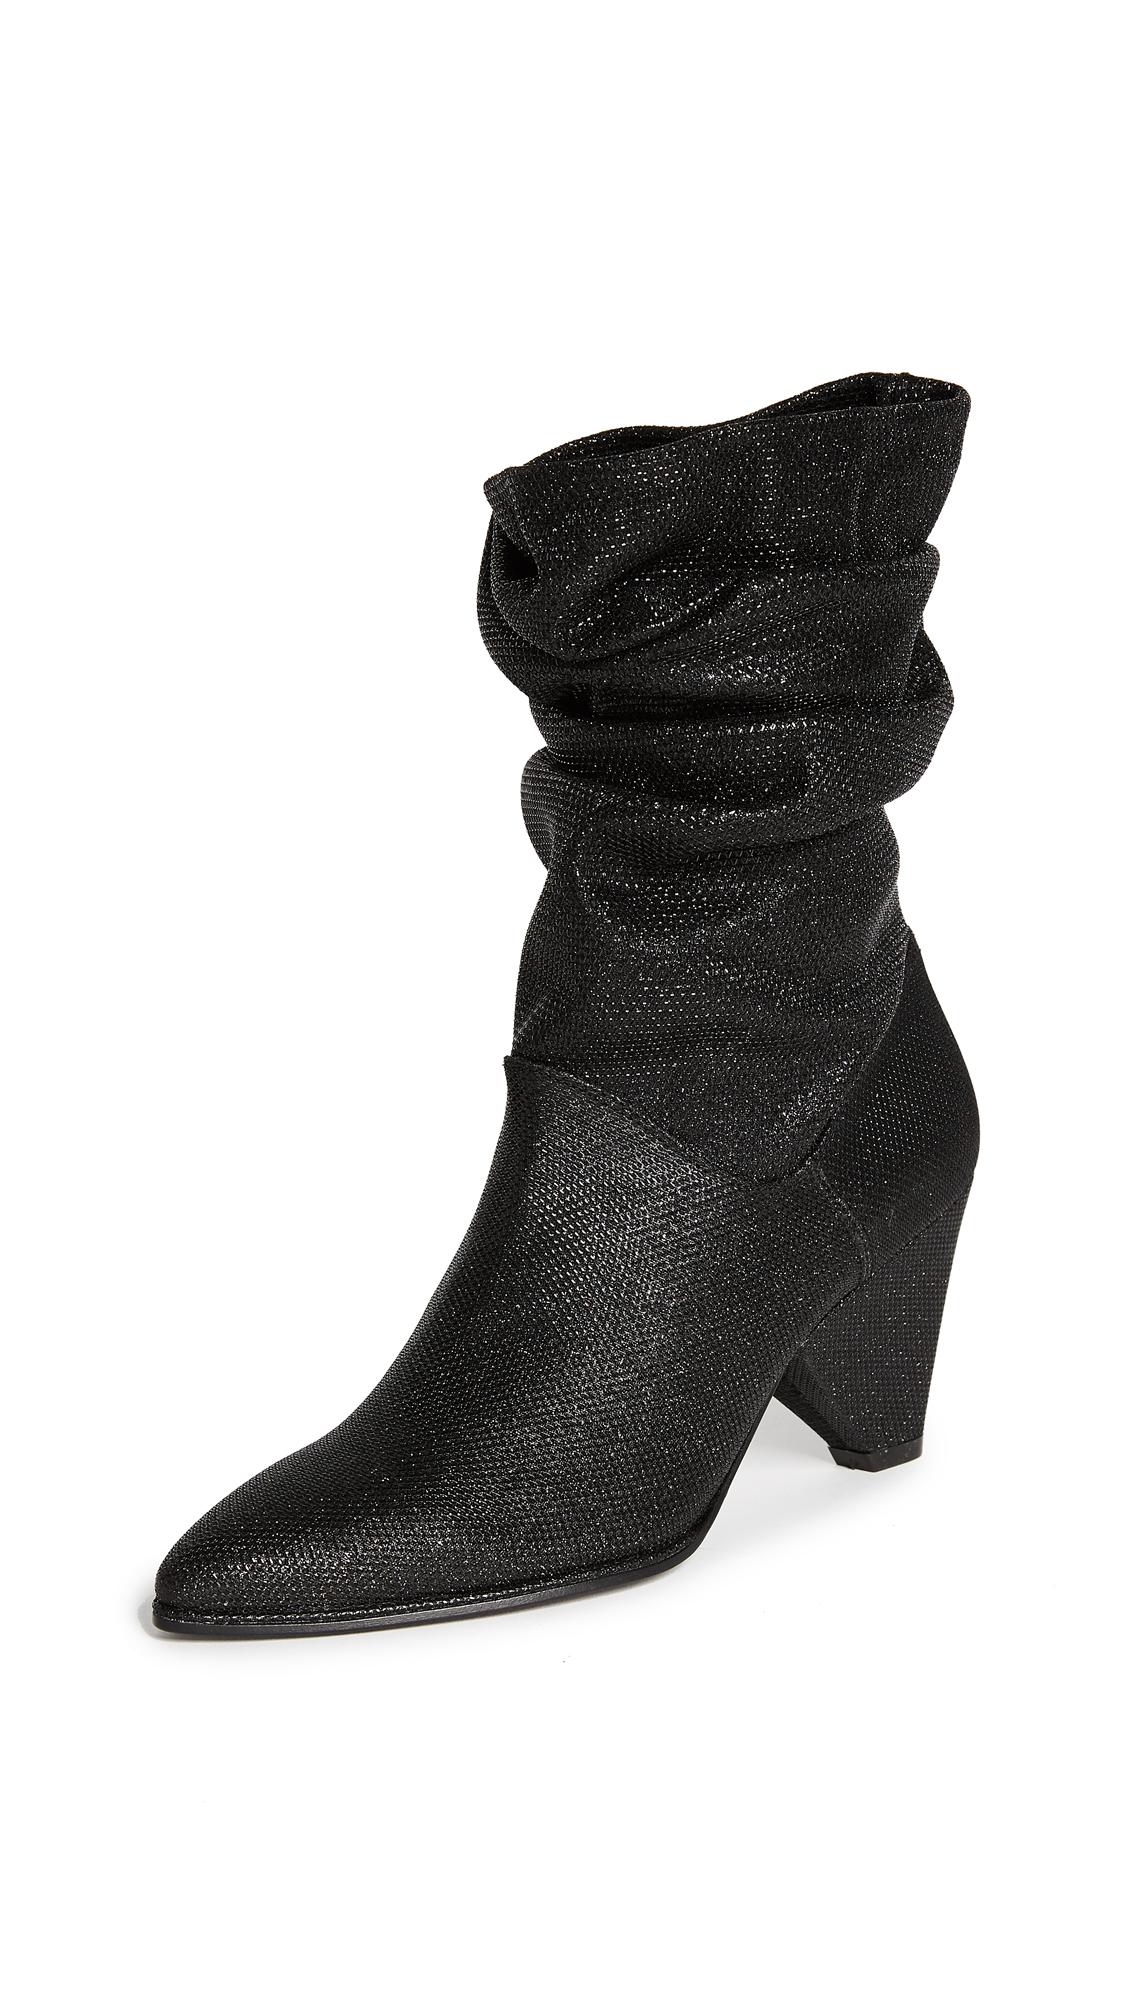 Stuart Weitzman Scrunch Boots - Black